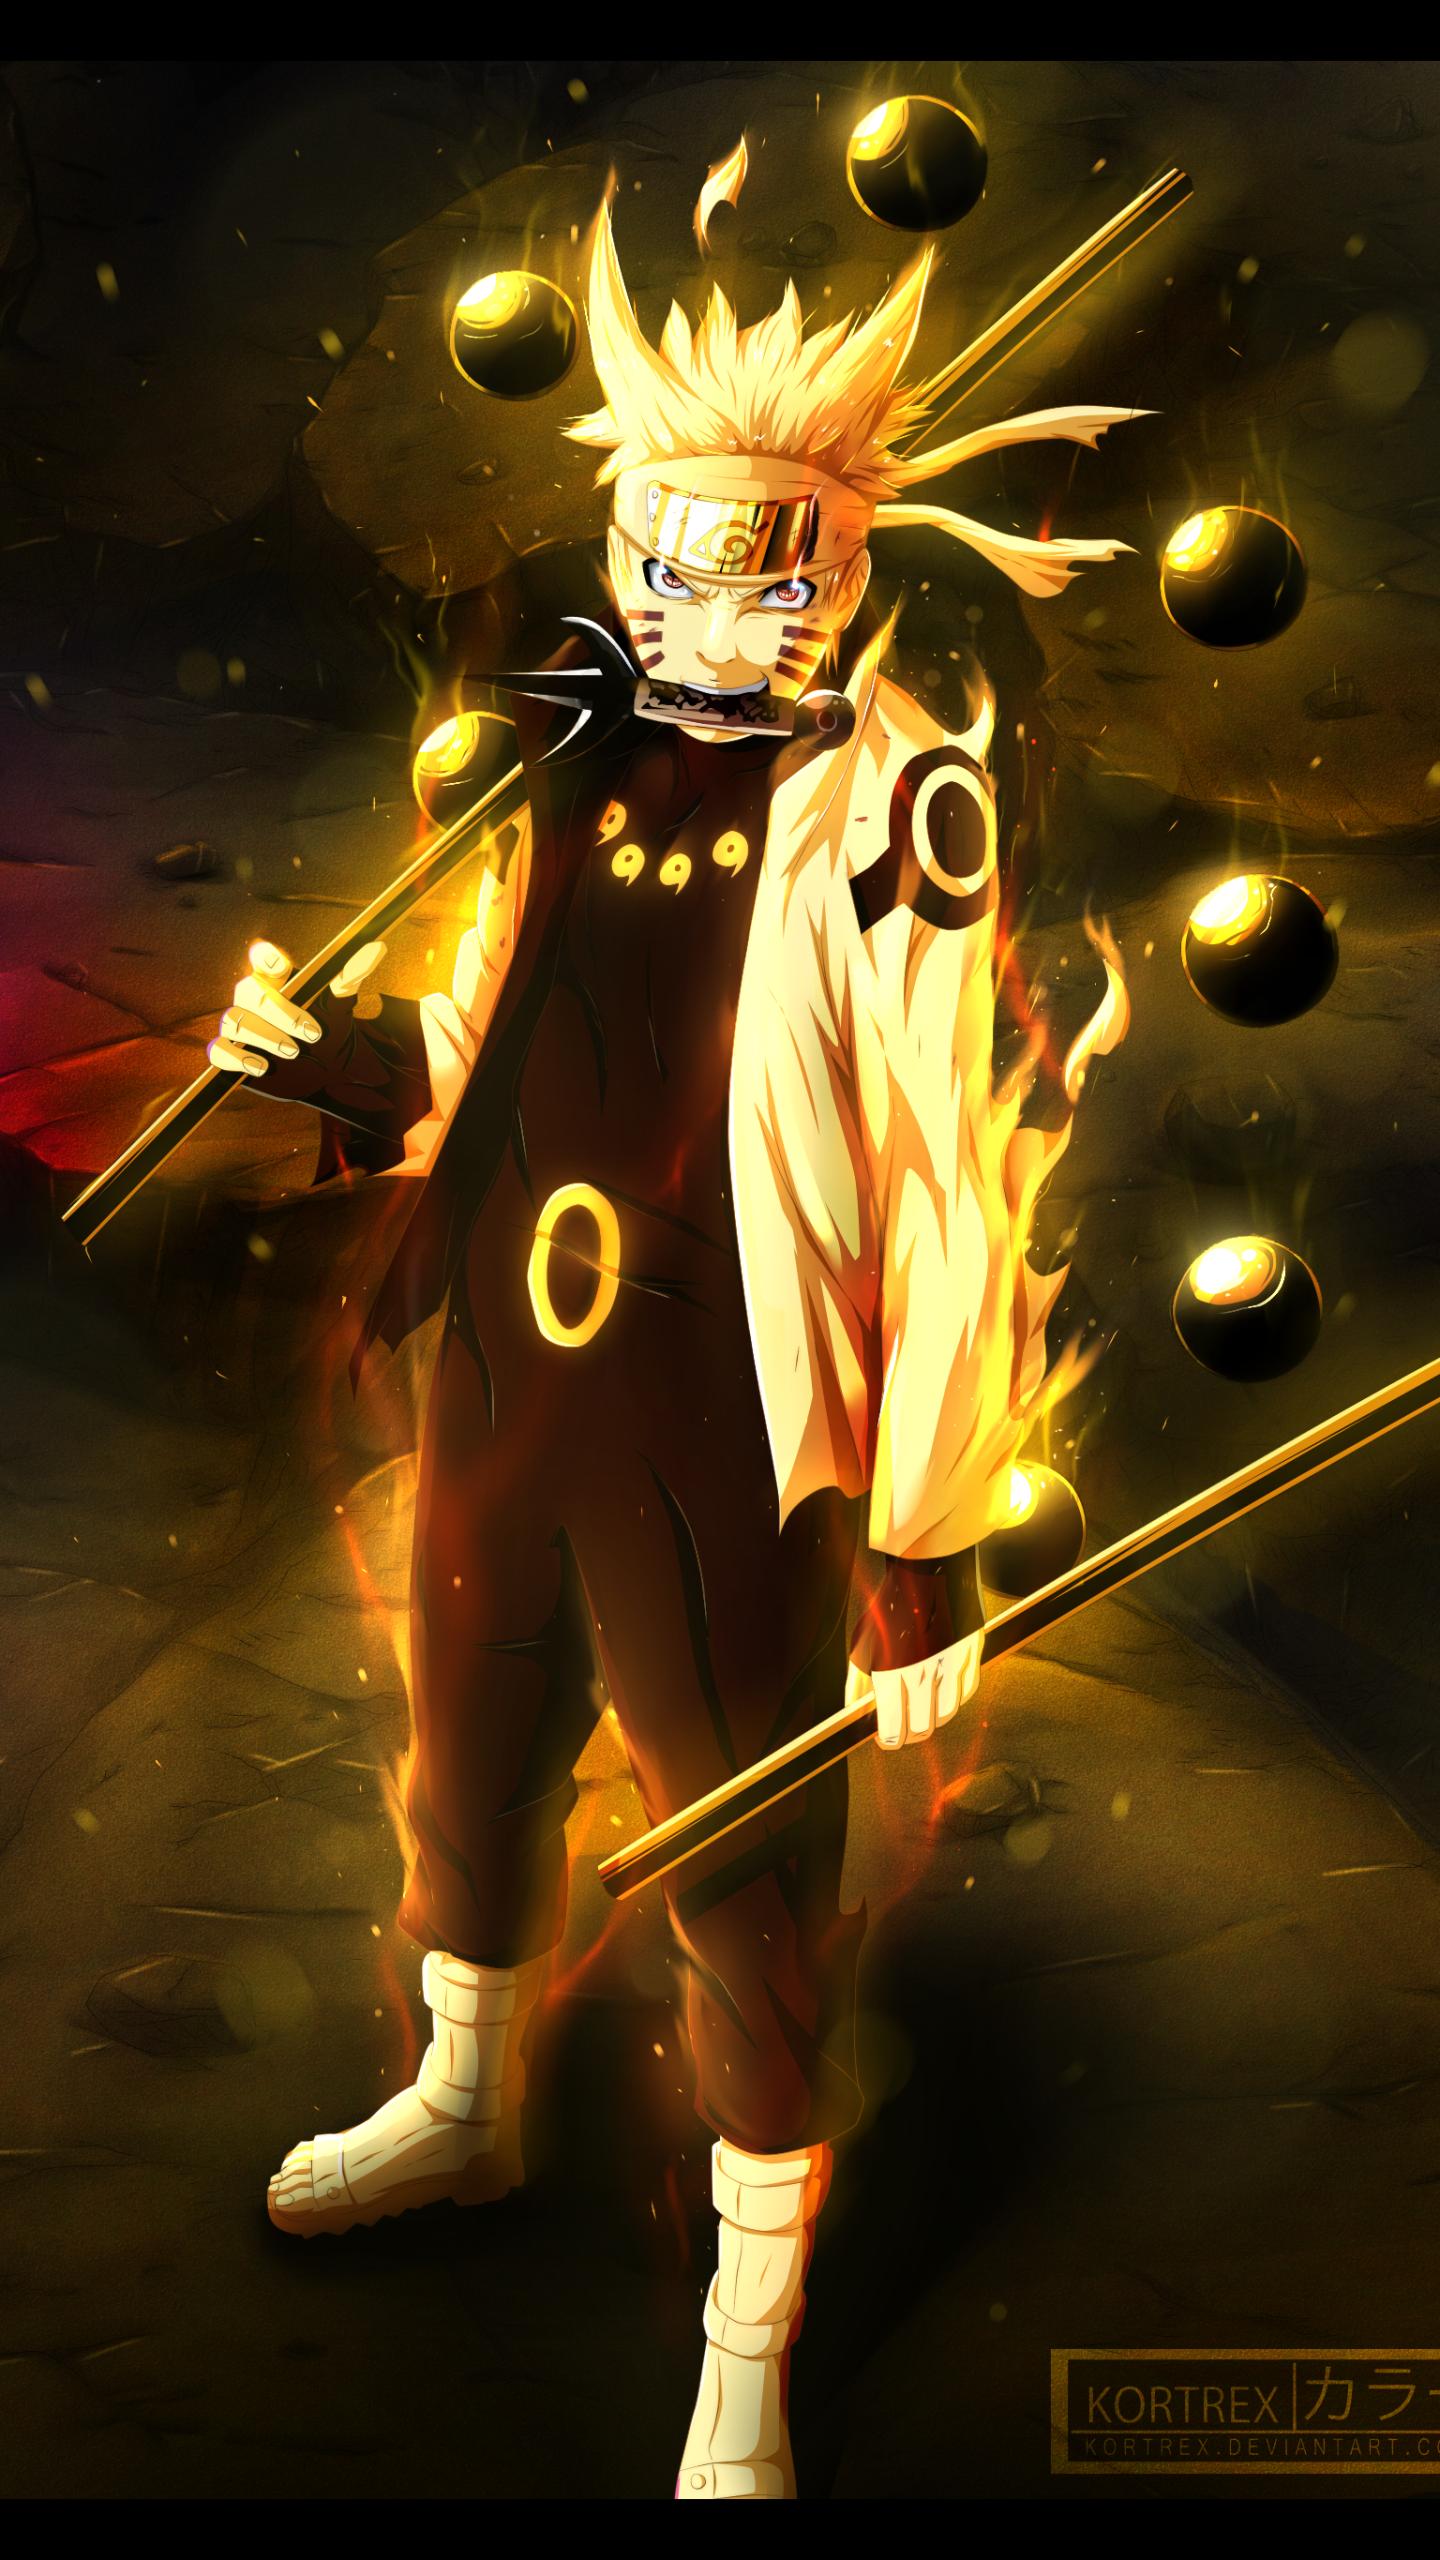 Naruto Mobile Wallpapers 103 Wallpapers Hd Wallpapers Com